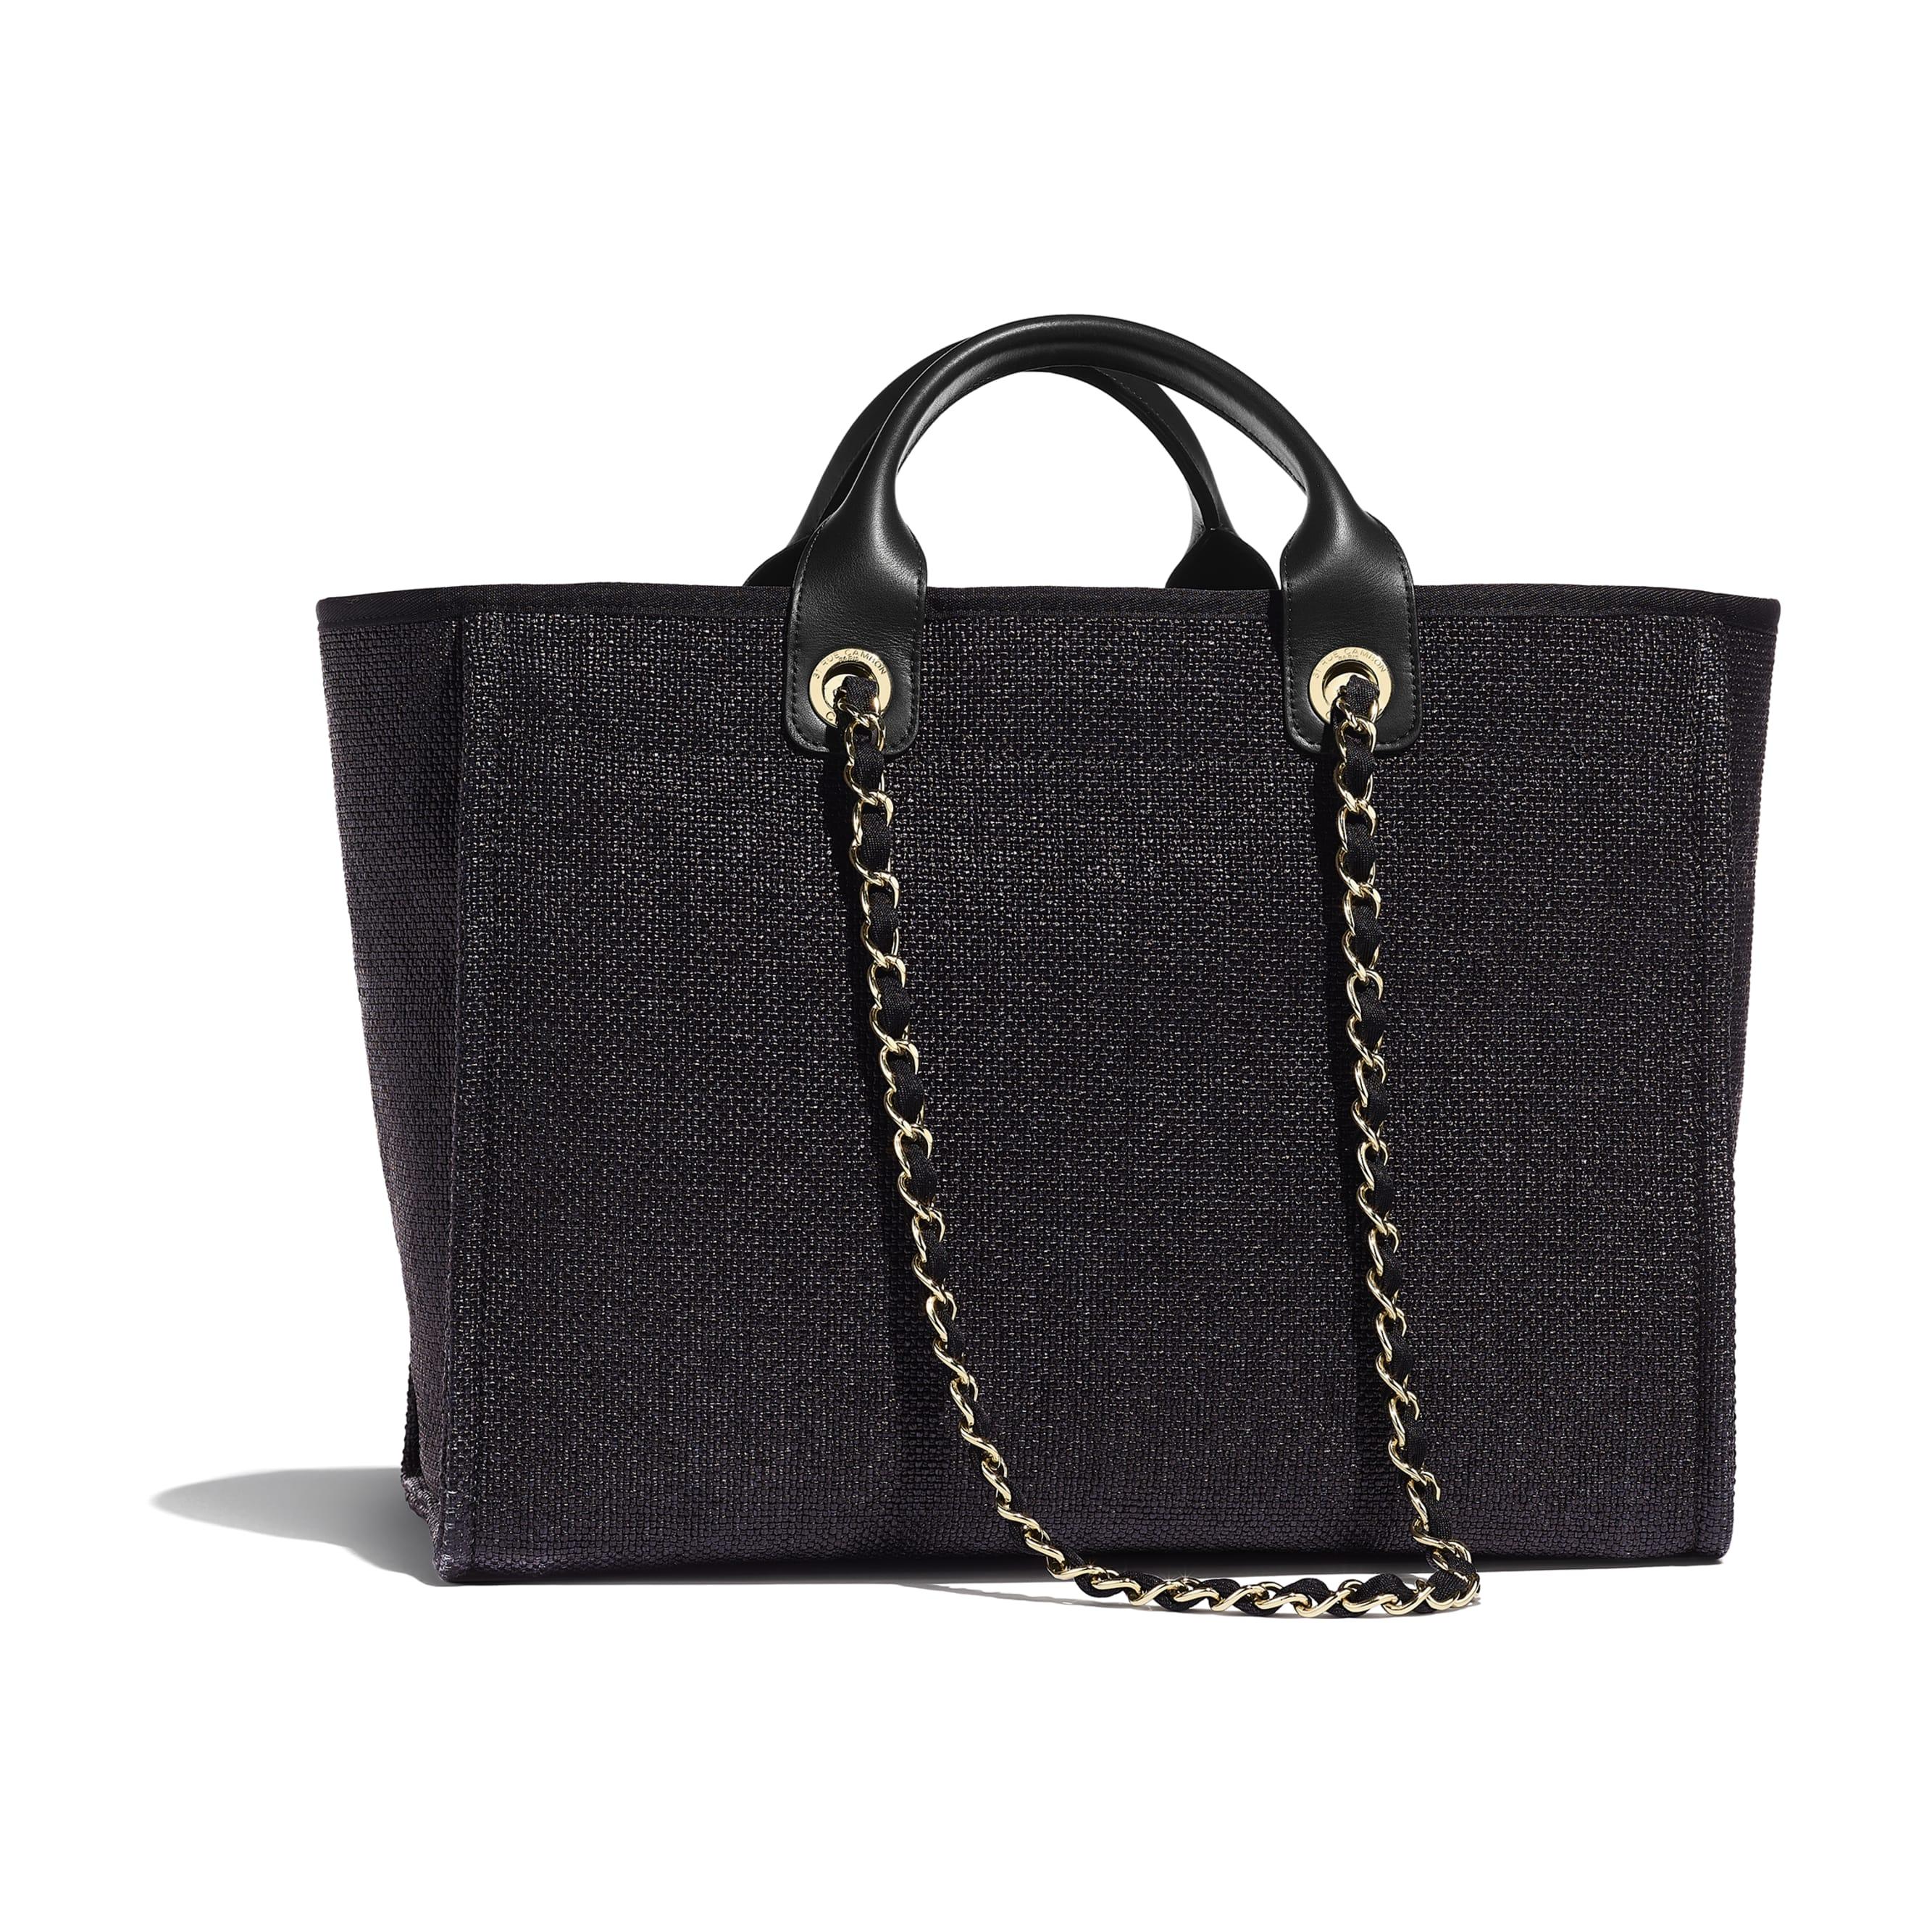 Shopping Bag - Black - Cotton, Nylon, Calfskin & Gold-Tone Metal - Alternative view - see standard sized version